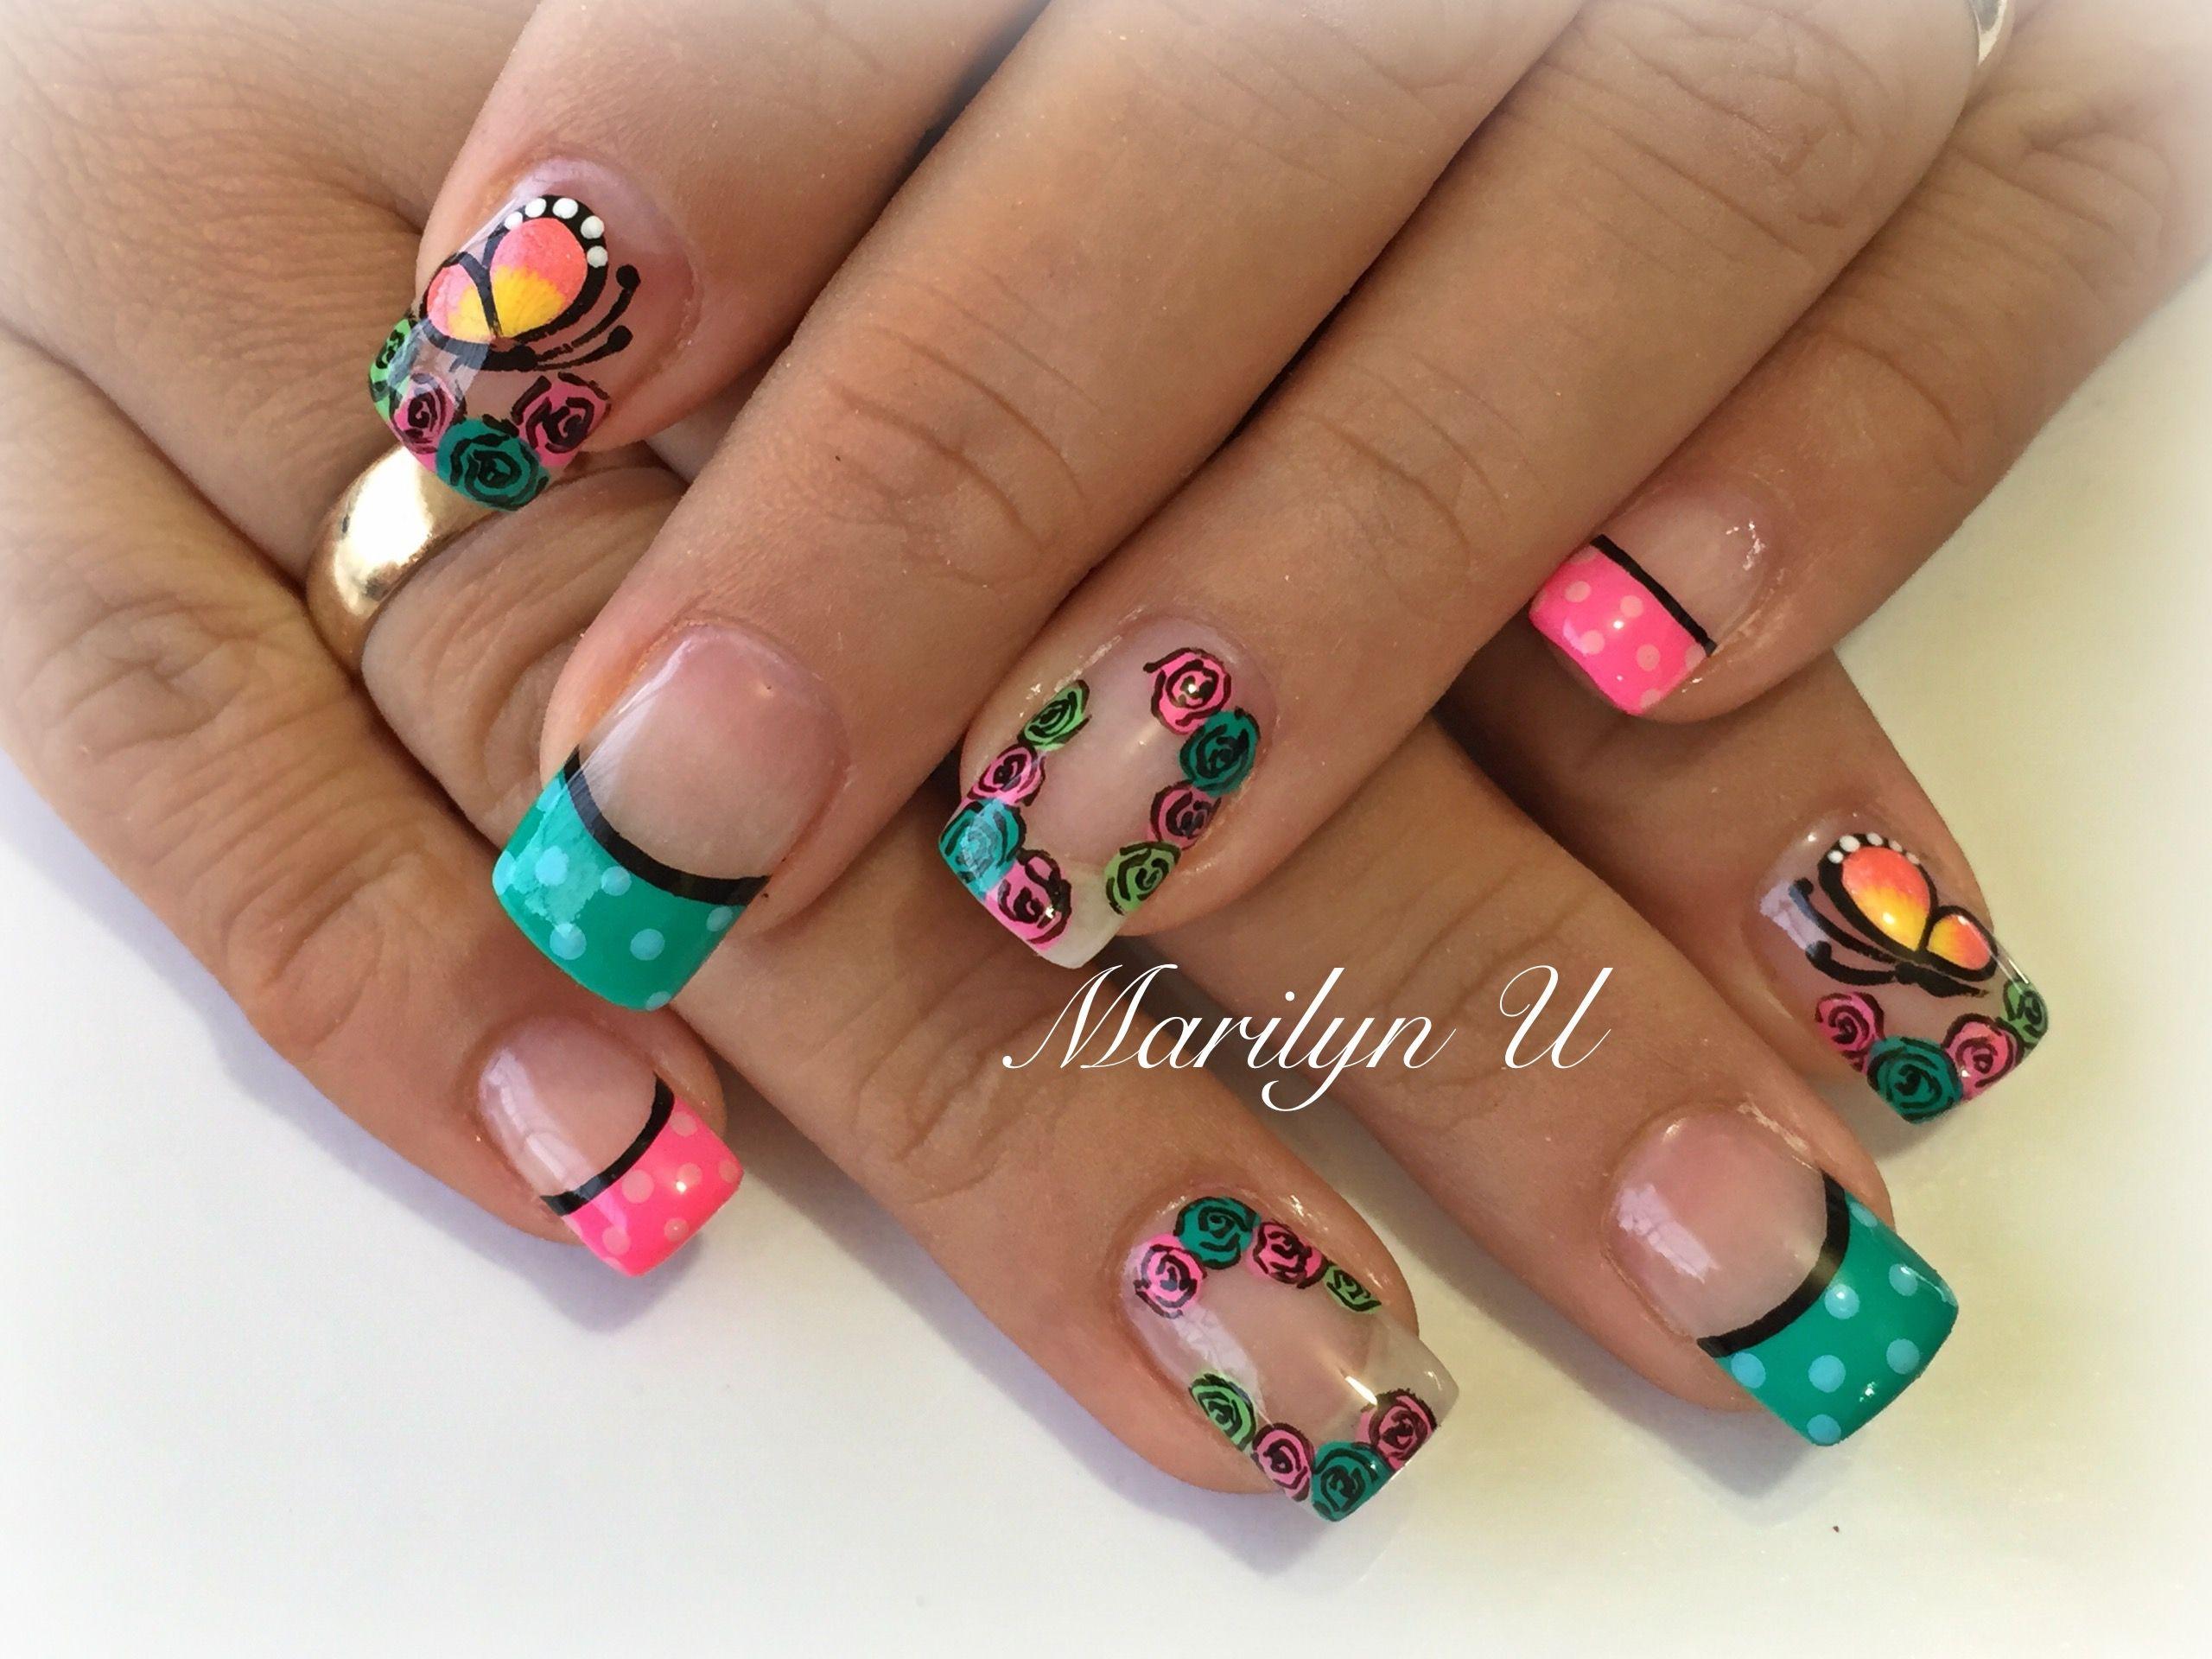 Pin by Marilyn Ugalde on Especialidad en uñas Marilyn | Pinterest